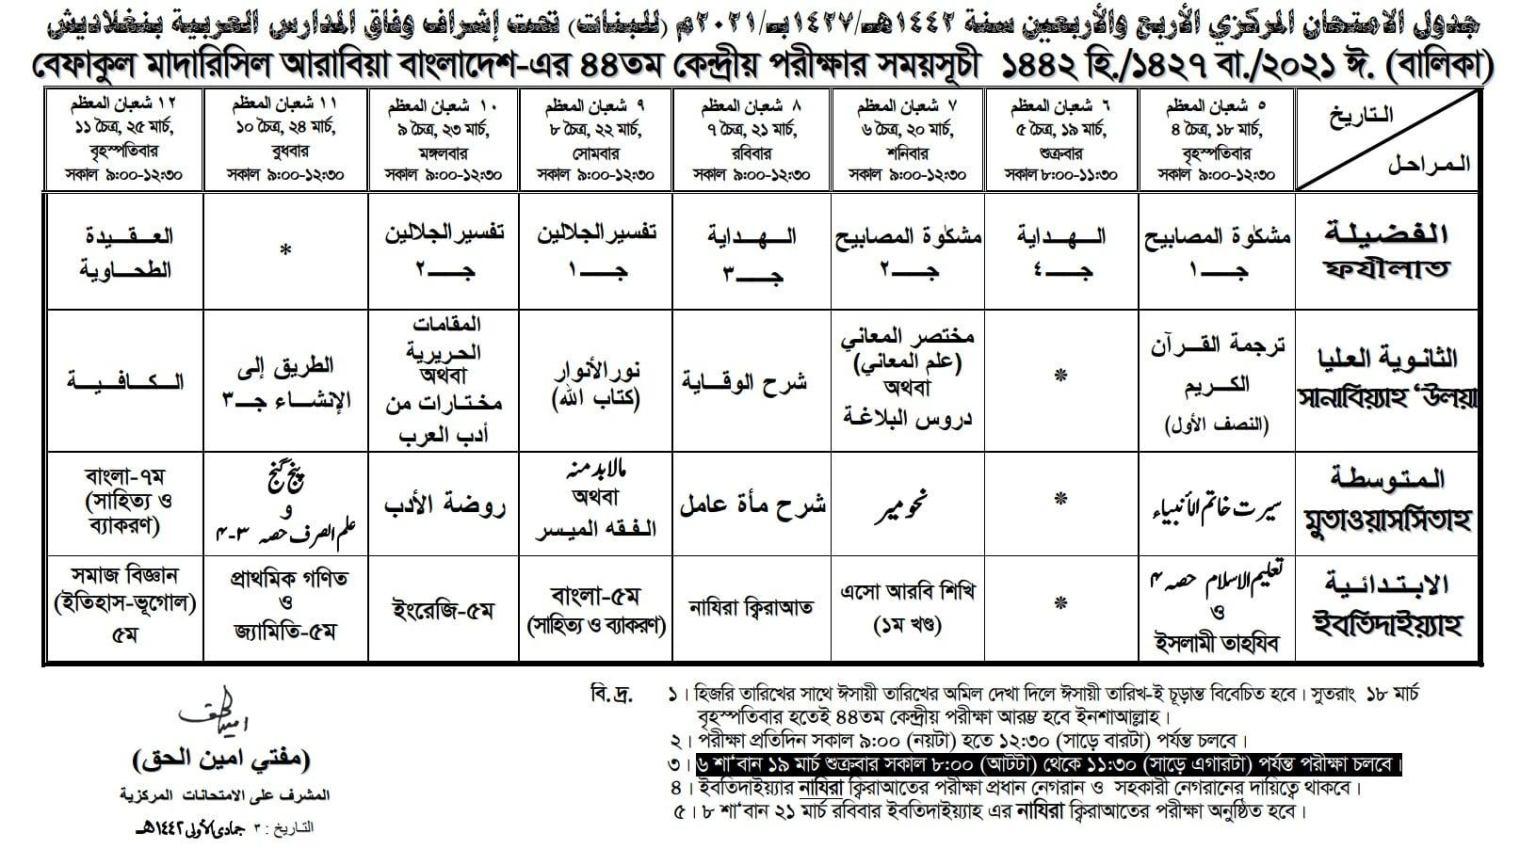 44th Befaq Exam Routine 2021 | ৪৪ তম বেফাক পরীক্ষার রুটিন ২০২১ নারী বিভাগ